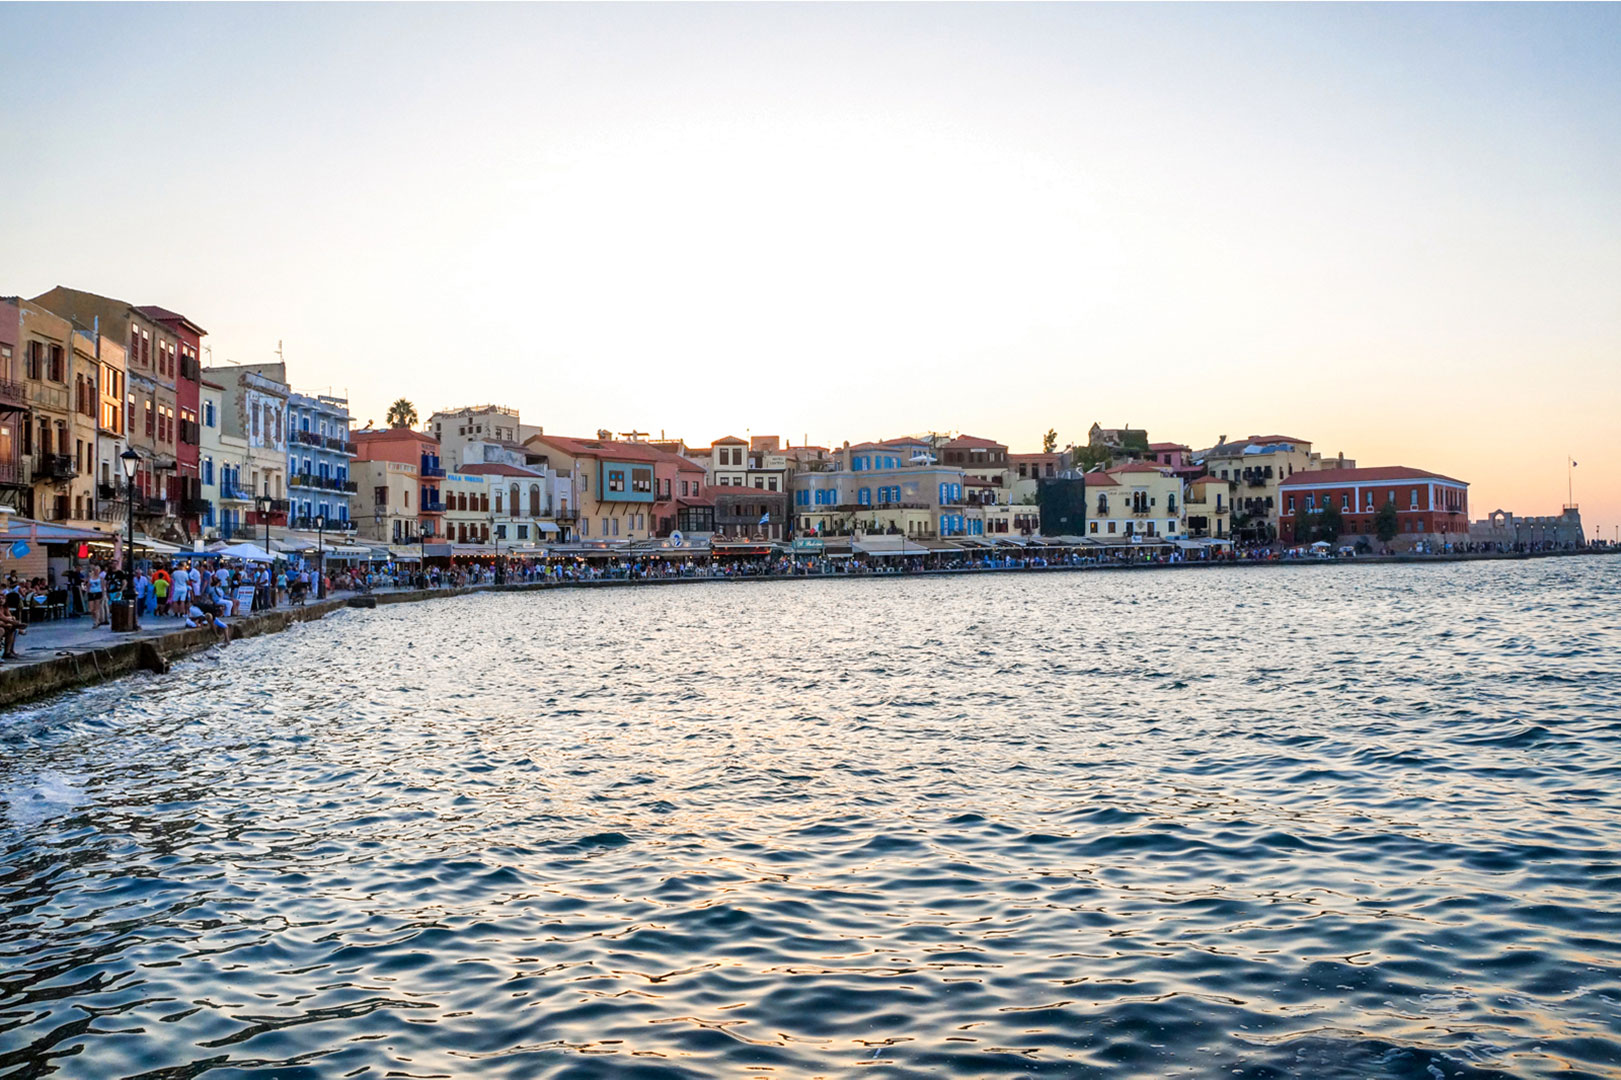 chania-crete-greece-la-vie-en-blog-all-rights-reserved-5